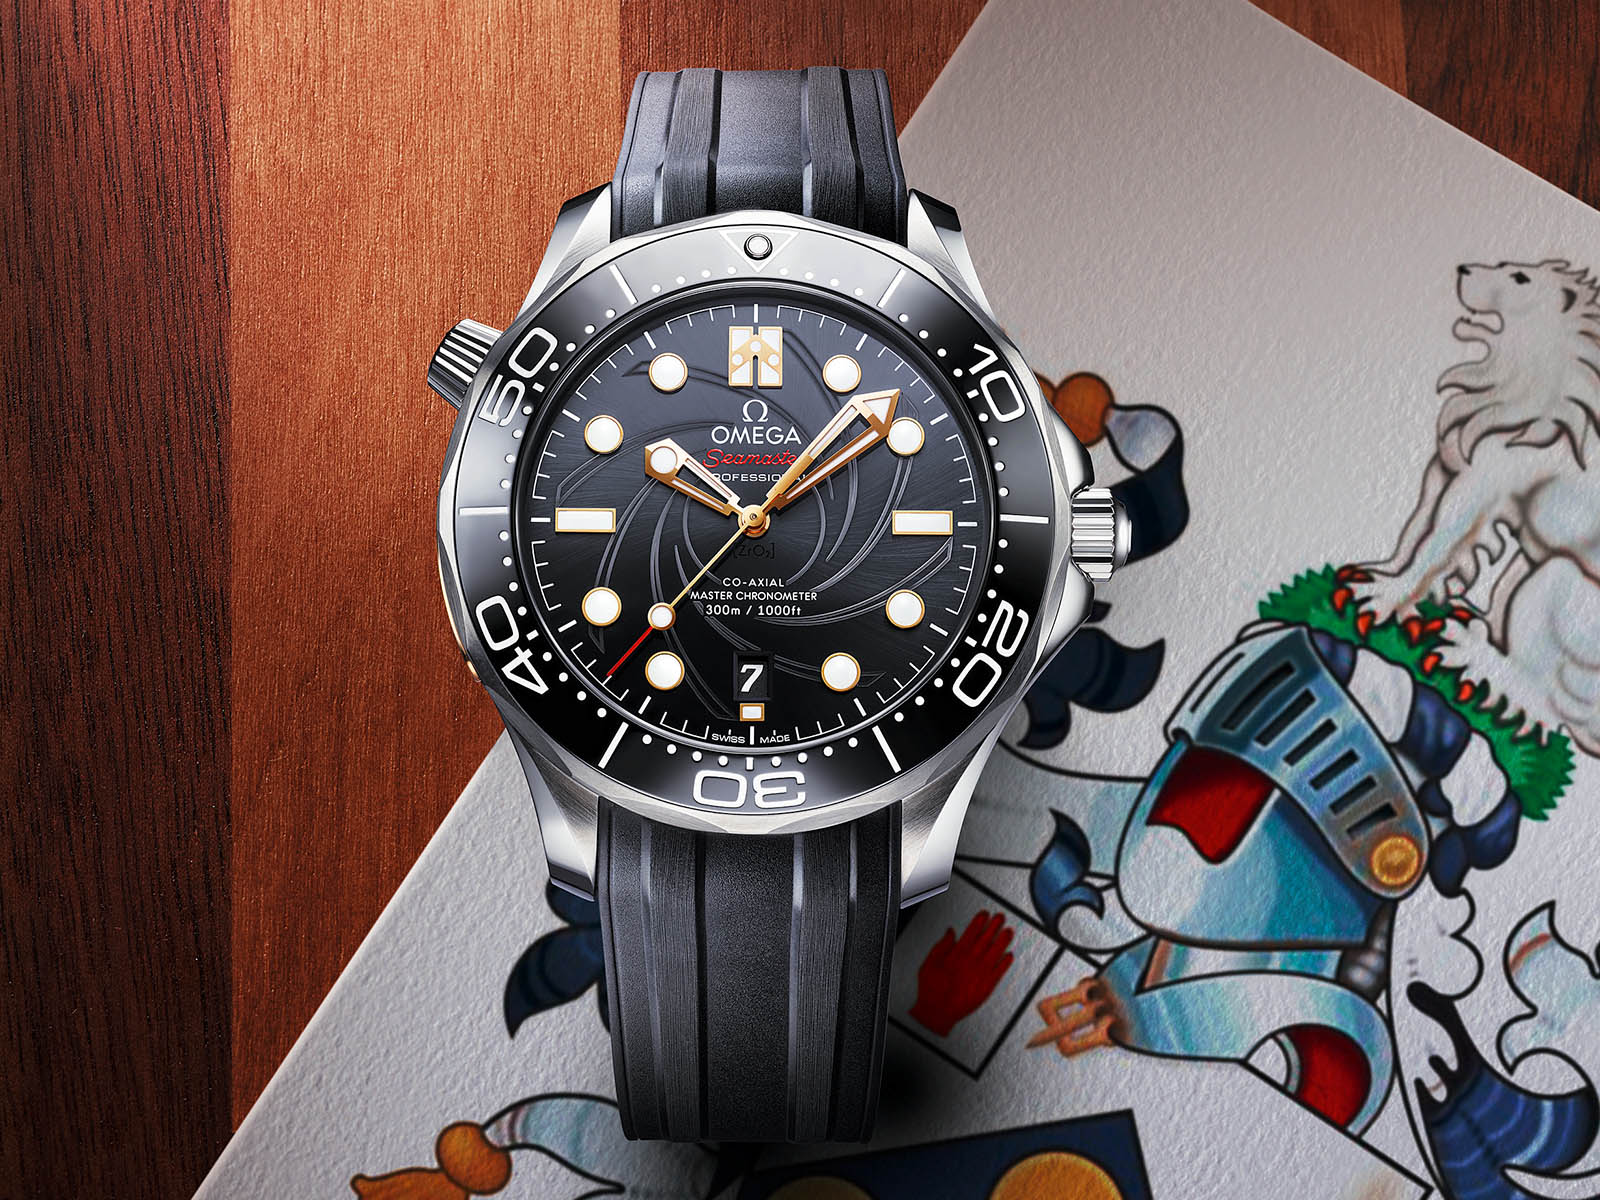 210-22-42-20-01-004-omega-seamaster-300m-diver-007-2-.jpg